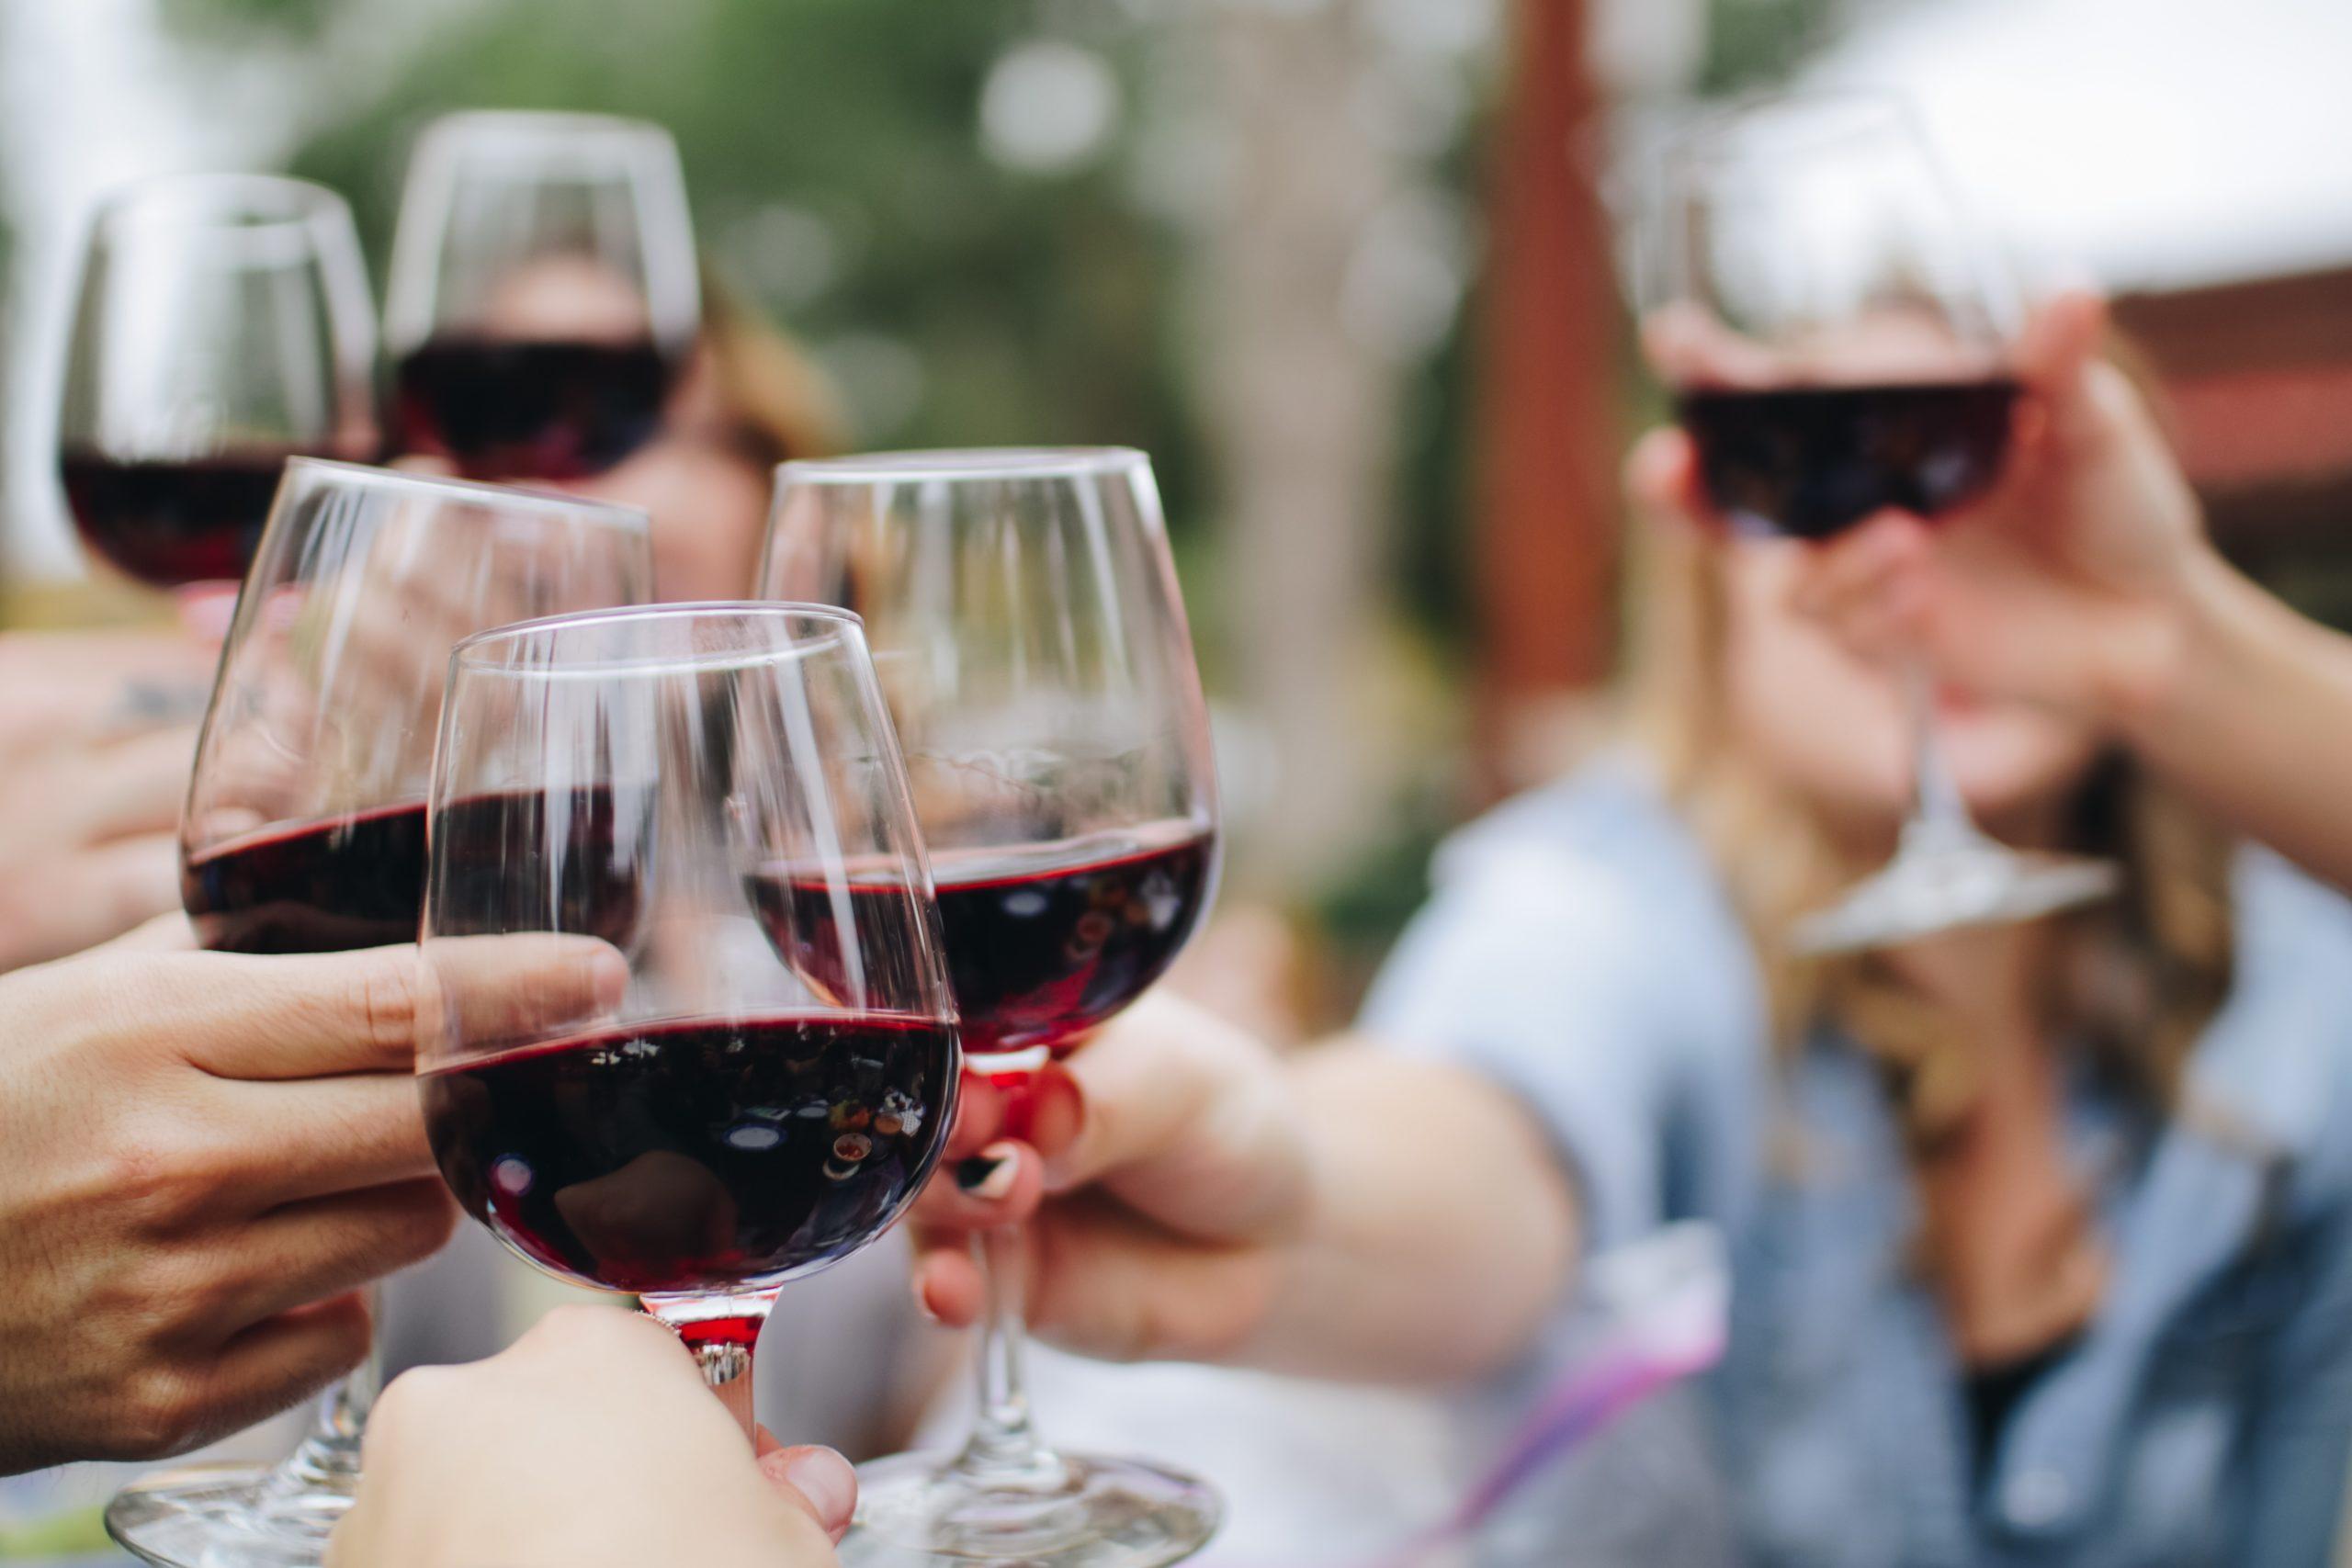 Several people raising their wine glasses in cheers